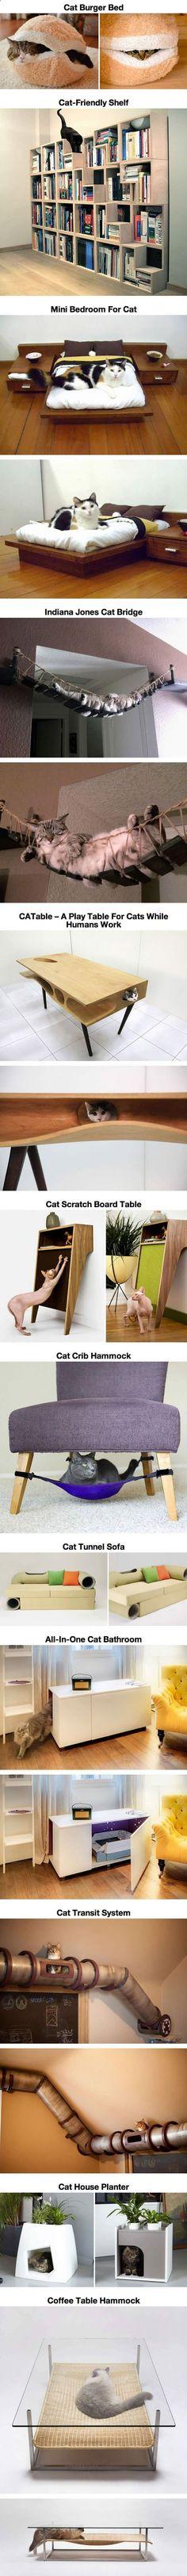 Cats Toys Ideas - Ein Paradies für Katzen Teil 1 | Webfail - Fail Bilder und Fail Videos - Ideal toys for small cats #CatToy